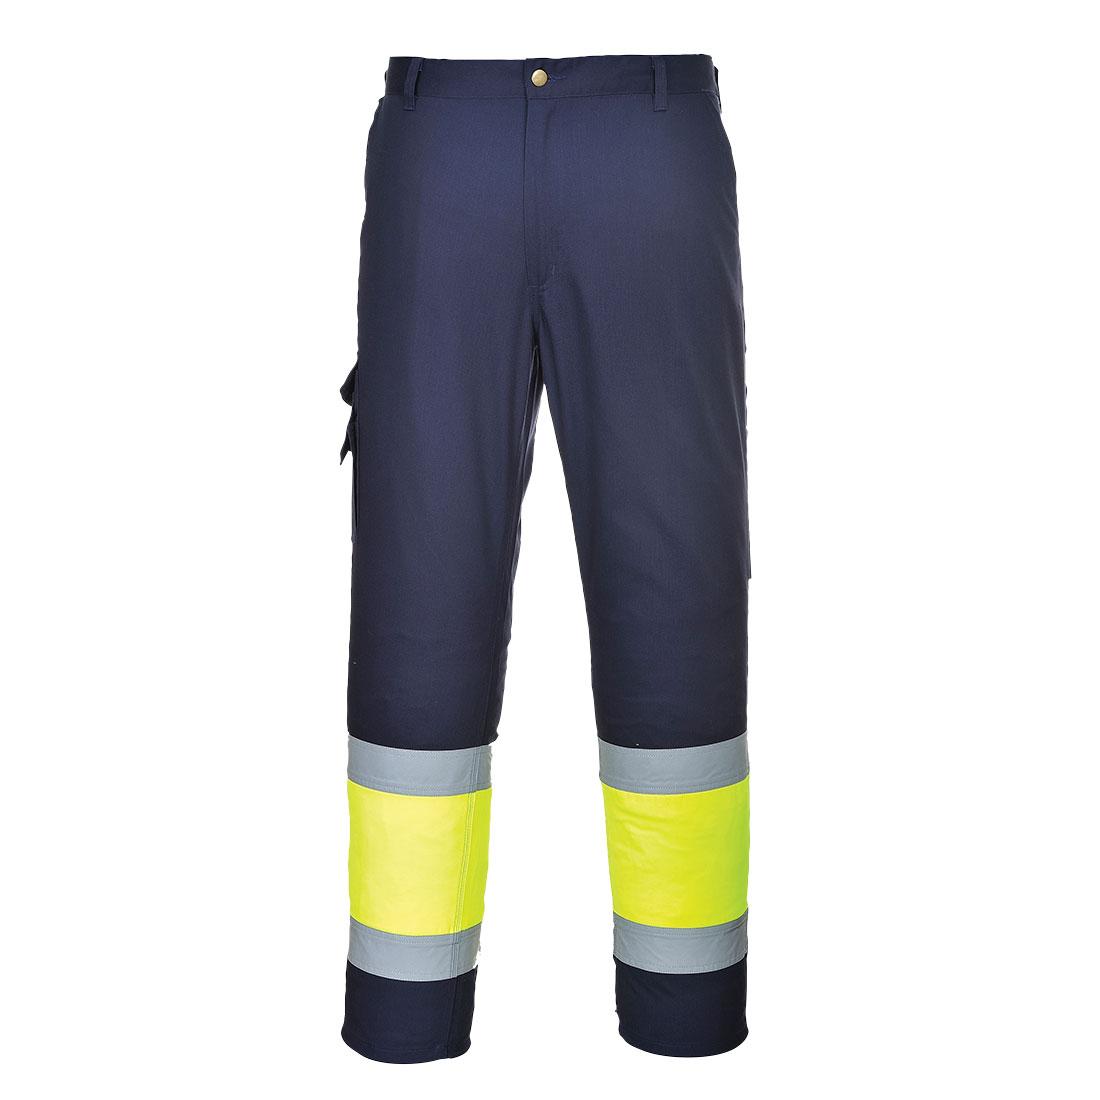 Portwest Hi-Vis Bicolor Combat Trousers (Geel/Navy) M